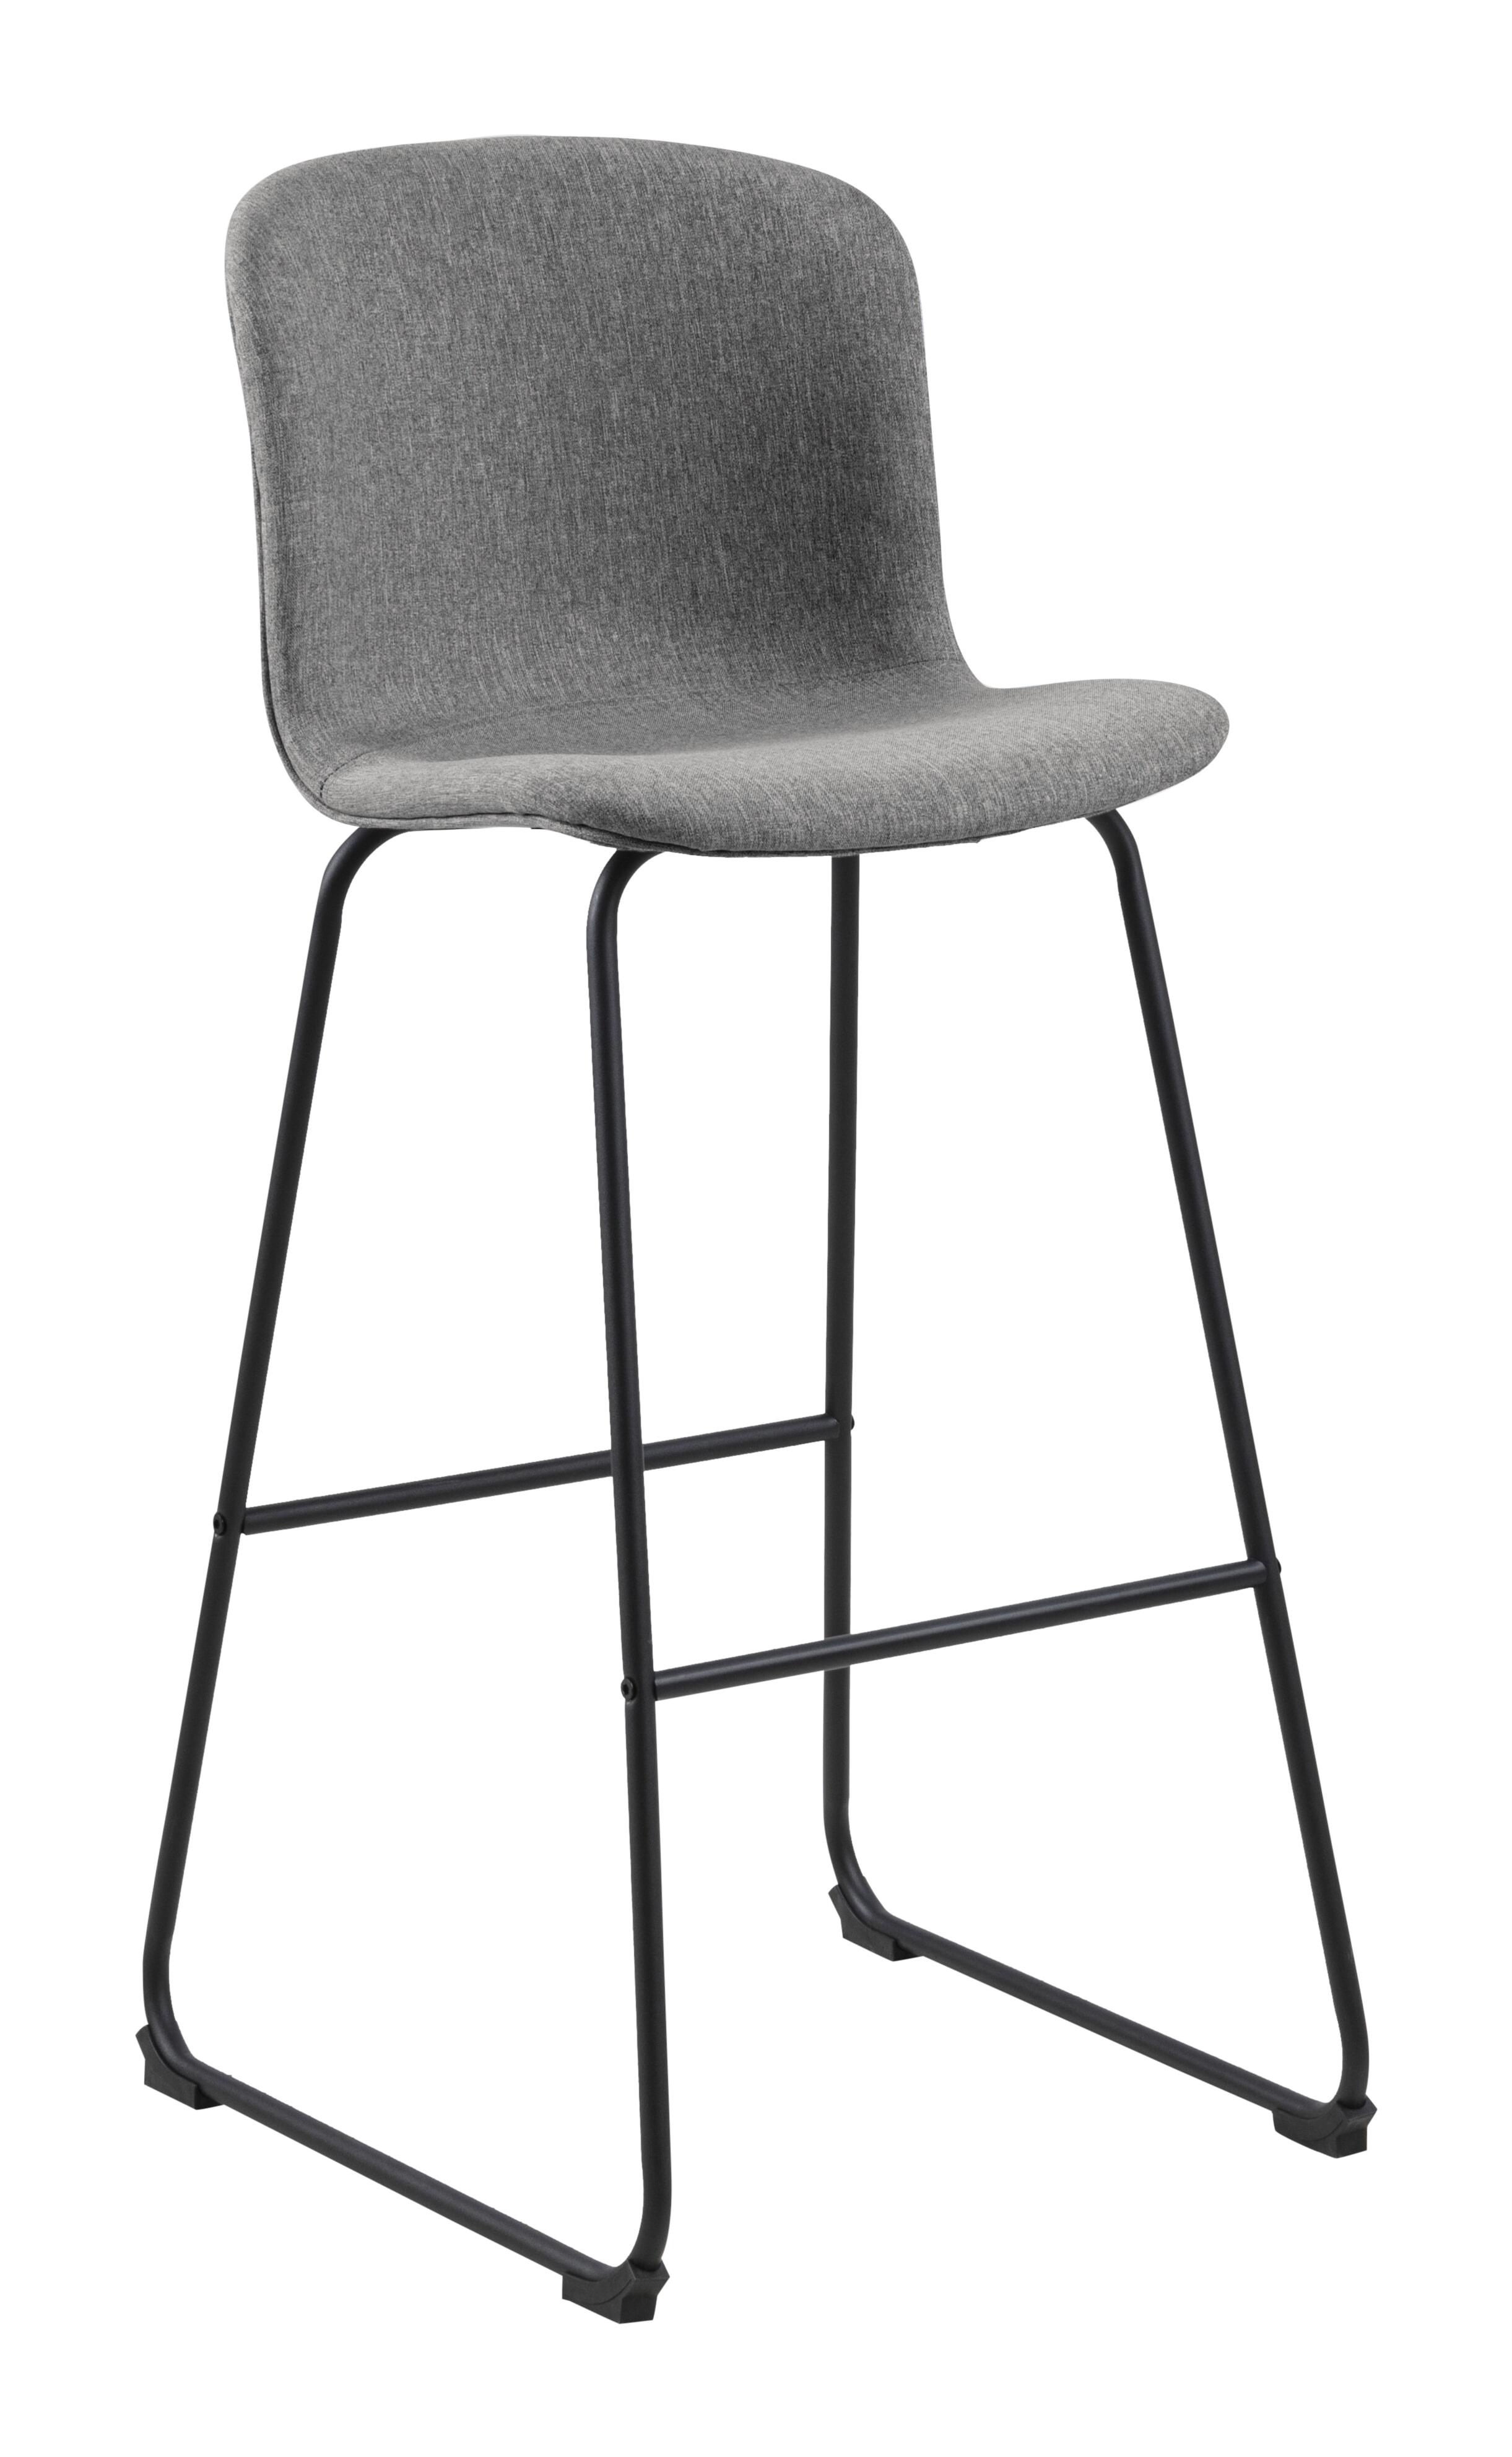 Interstil Barkruk 'Story' (zithoogte 75cm), kleur Grijs